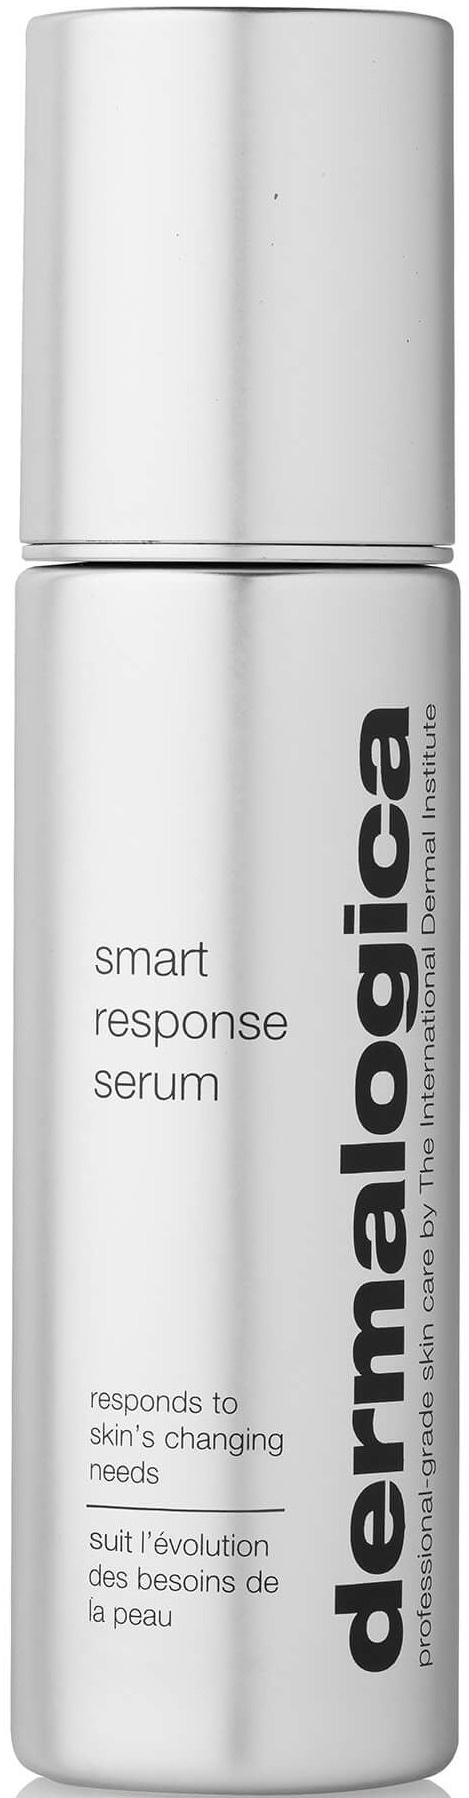 Dermalogica Smart Response Serum